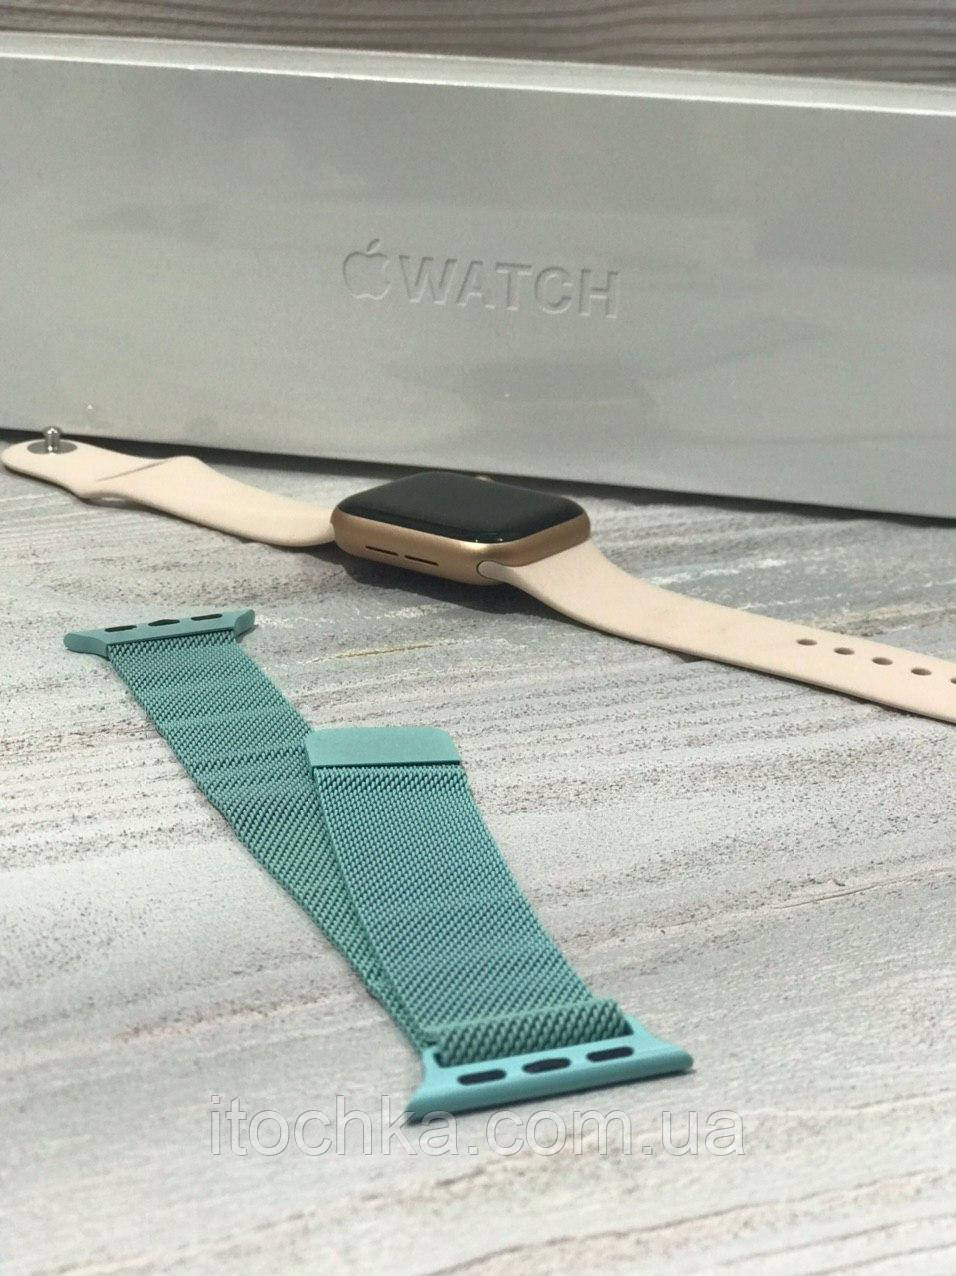 Ремешок для Apple Watch Milanese Loop 38mm Mint